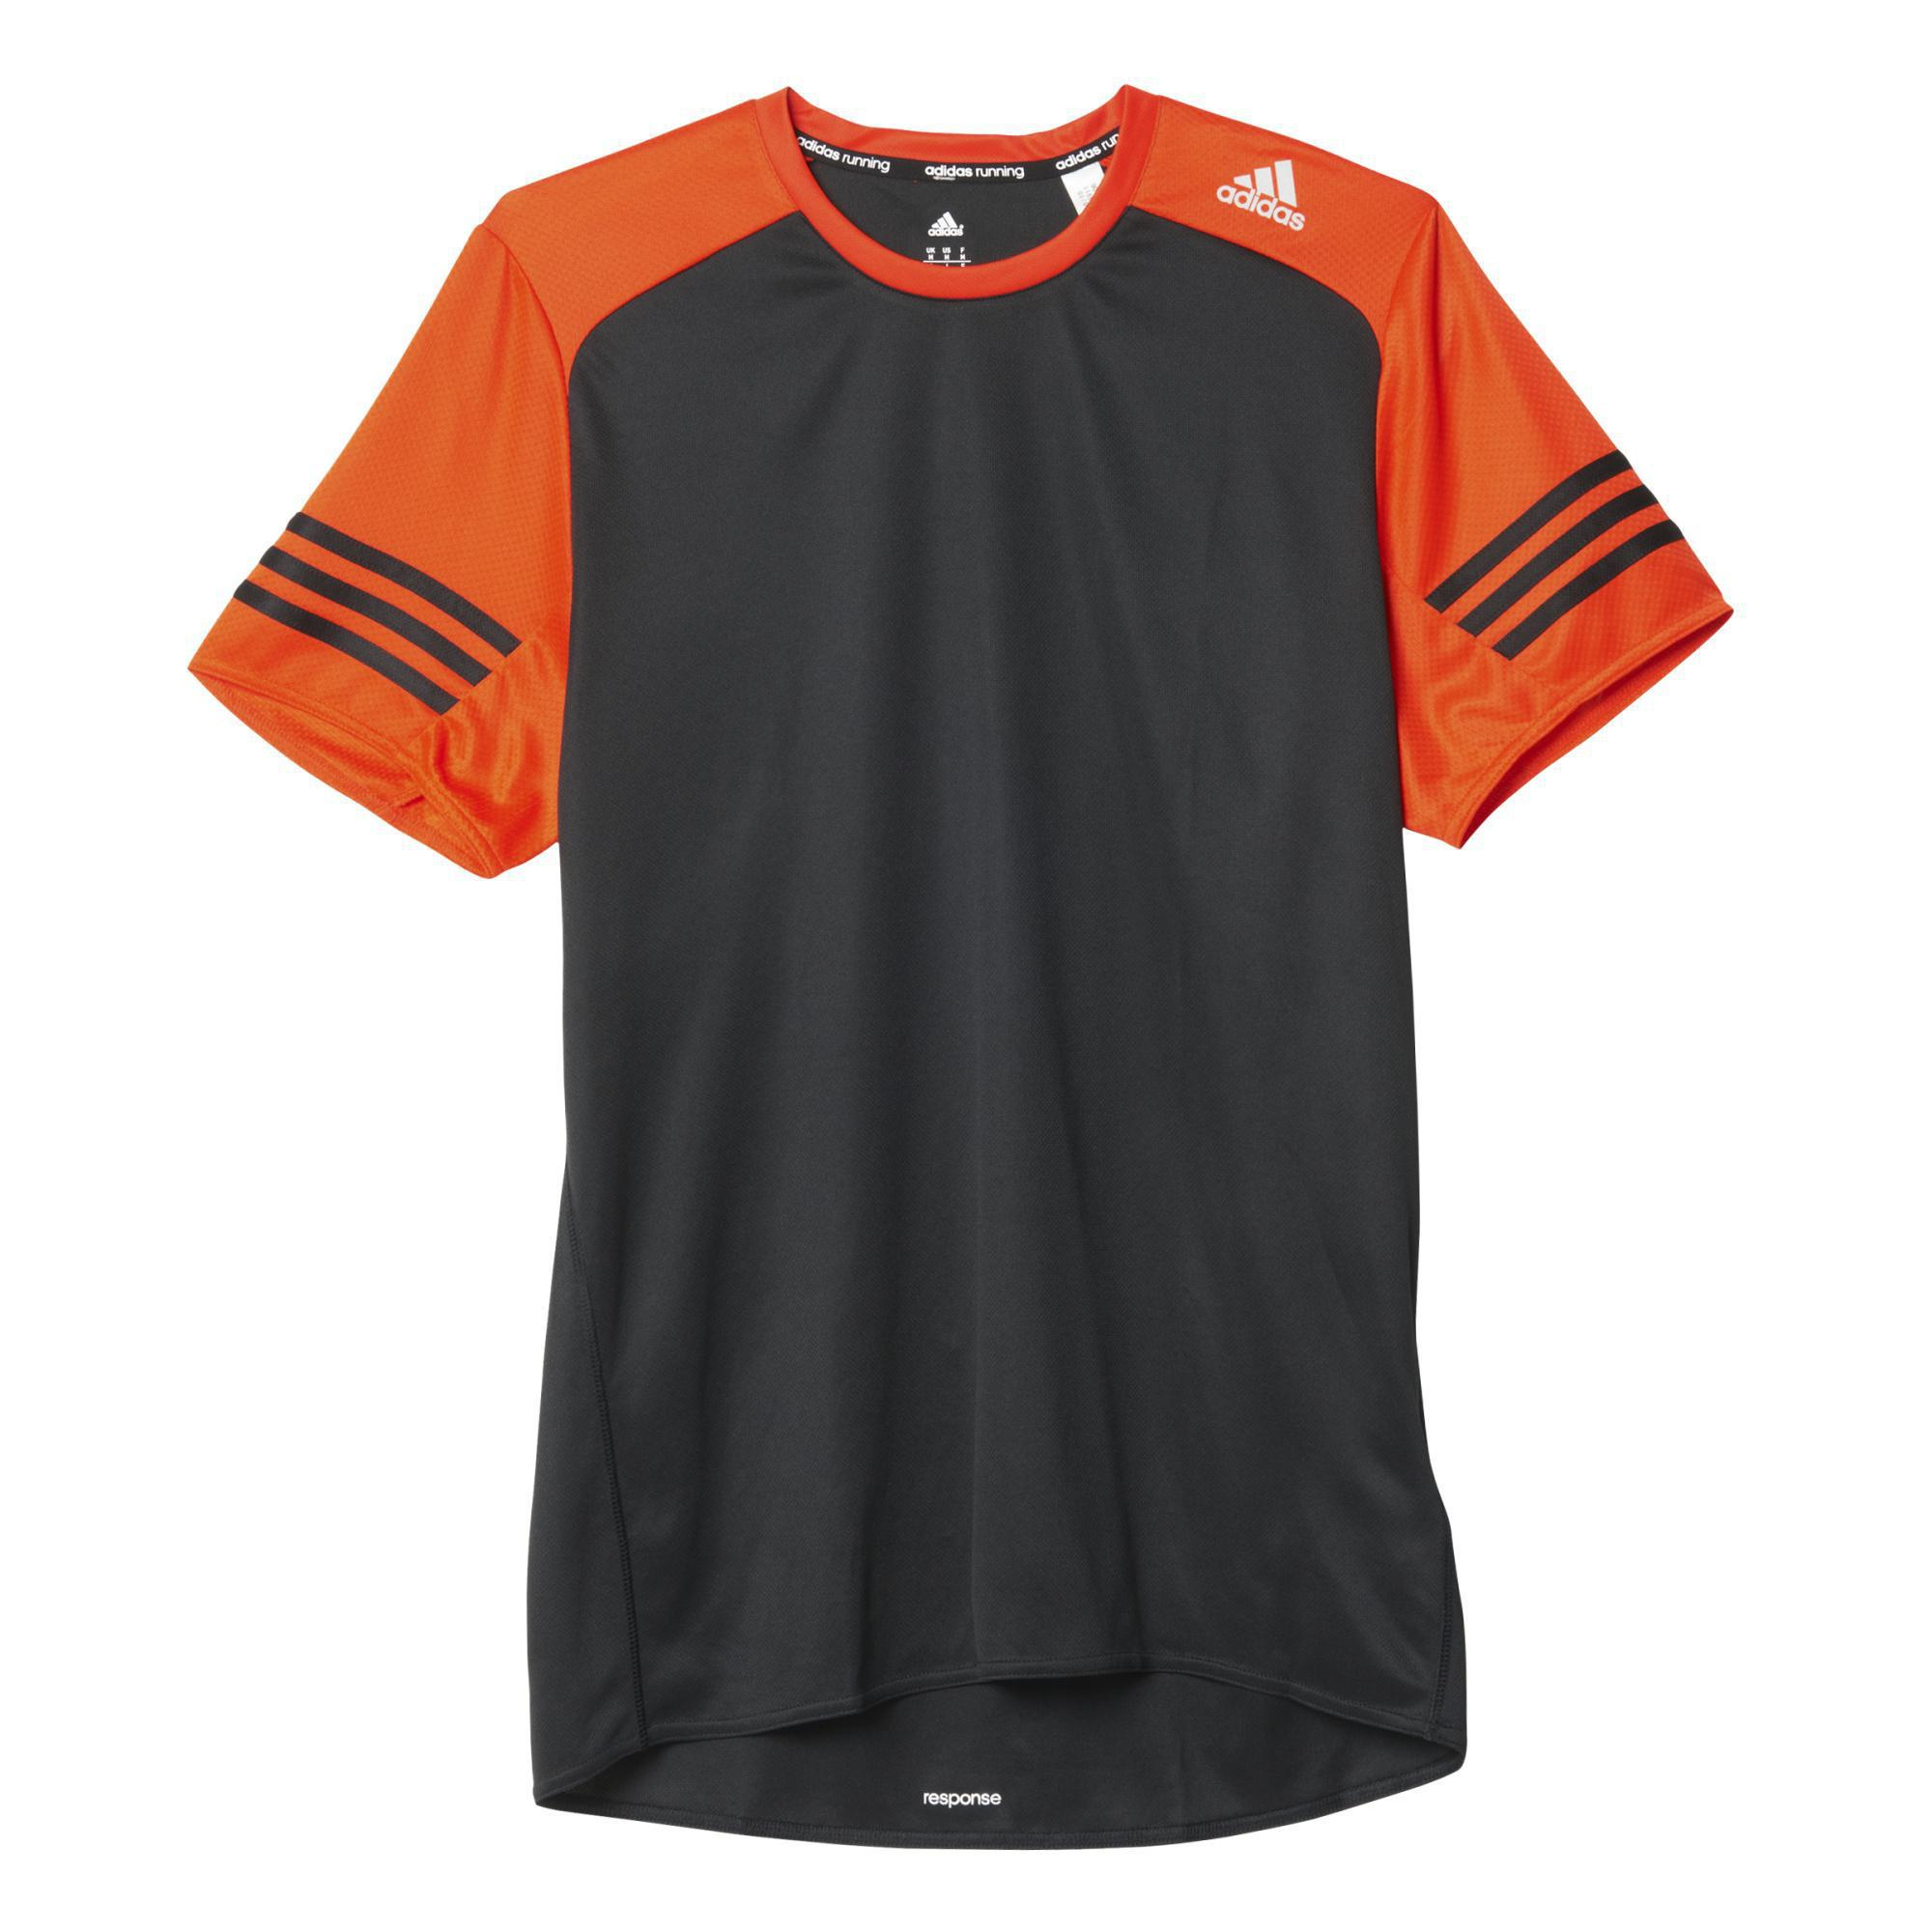 03213b9918e18 Adidas Mens Response Short Sleeve Tee - Black/Bold Orange - Tennisnuts.com